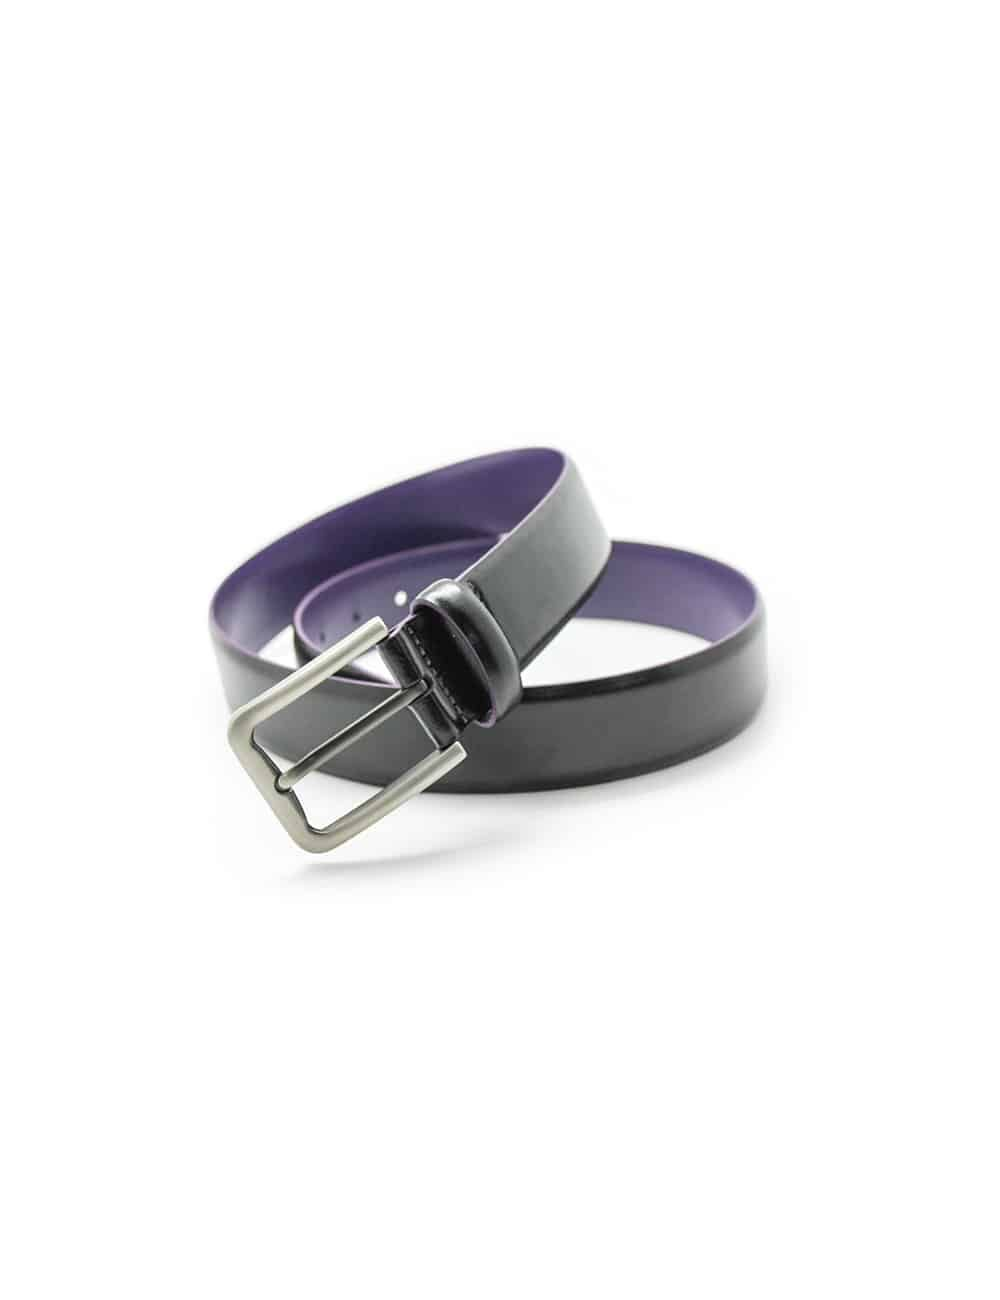 Black & Royal Purple Leather Belt LB1.5